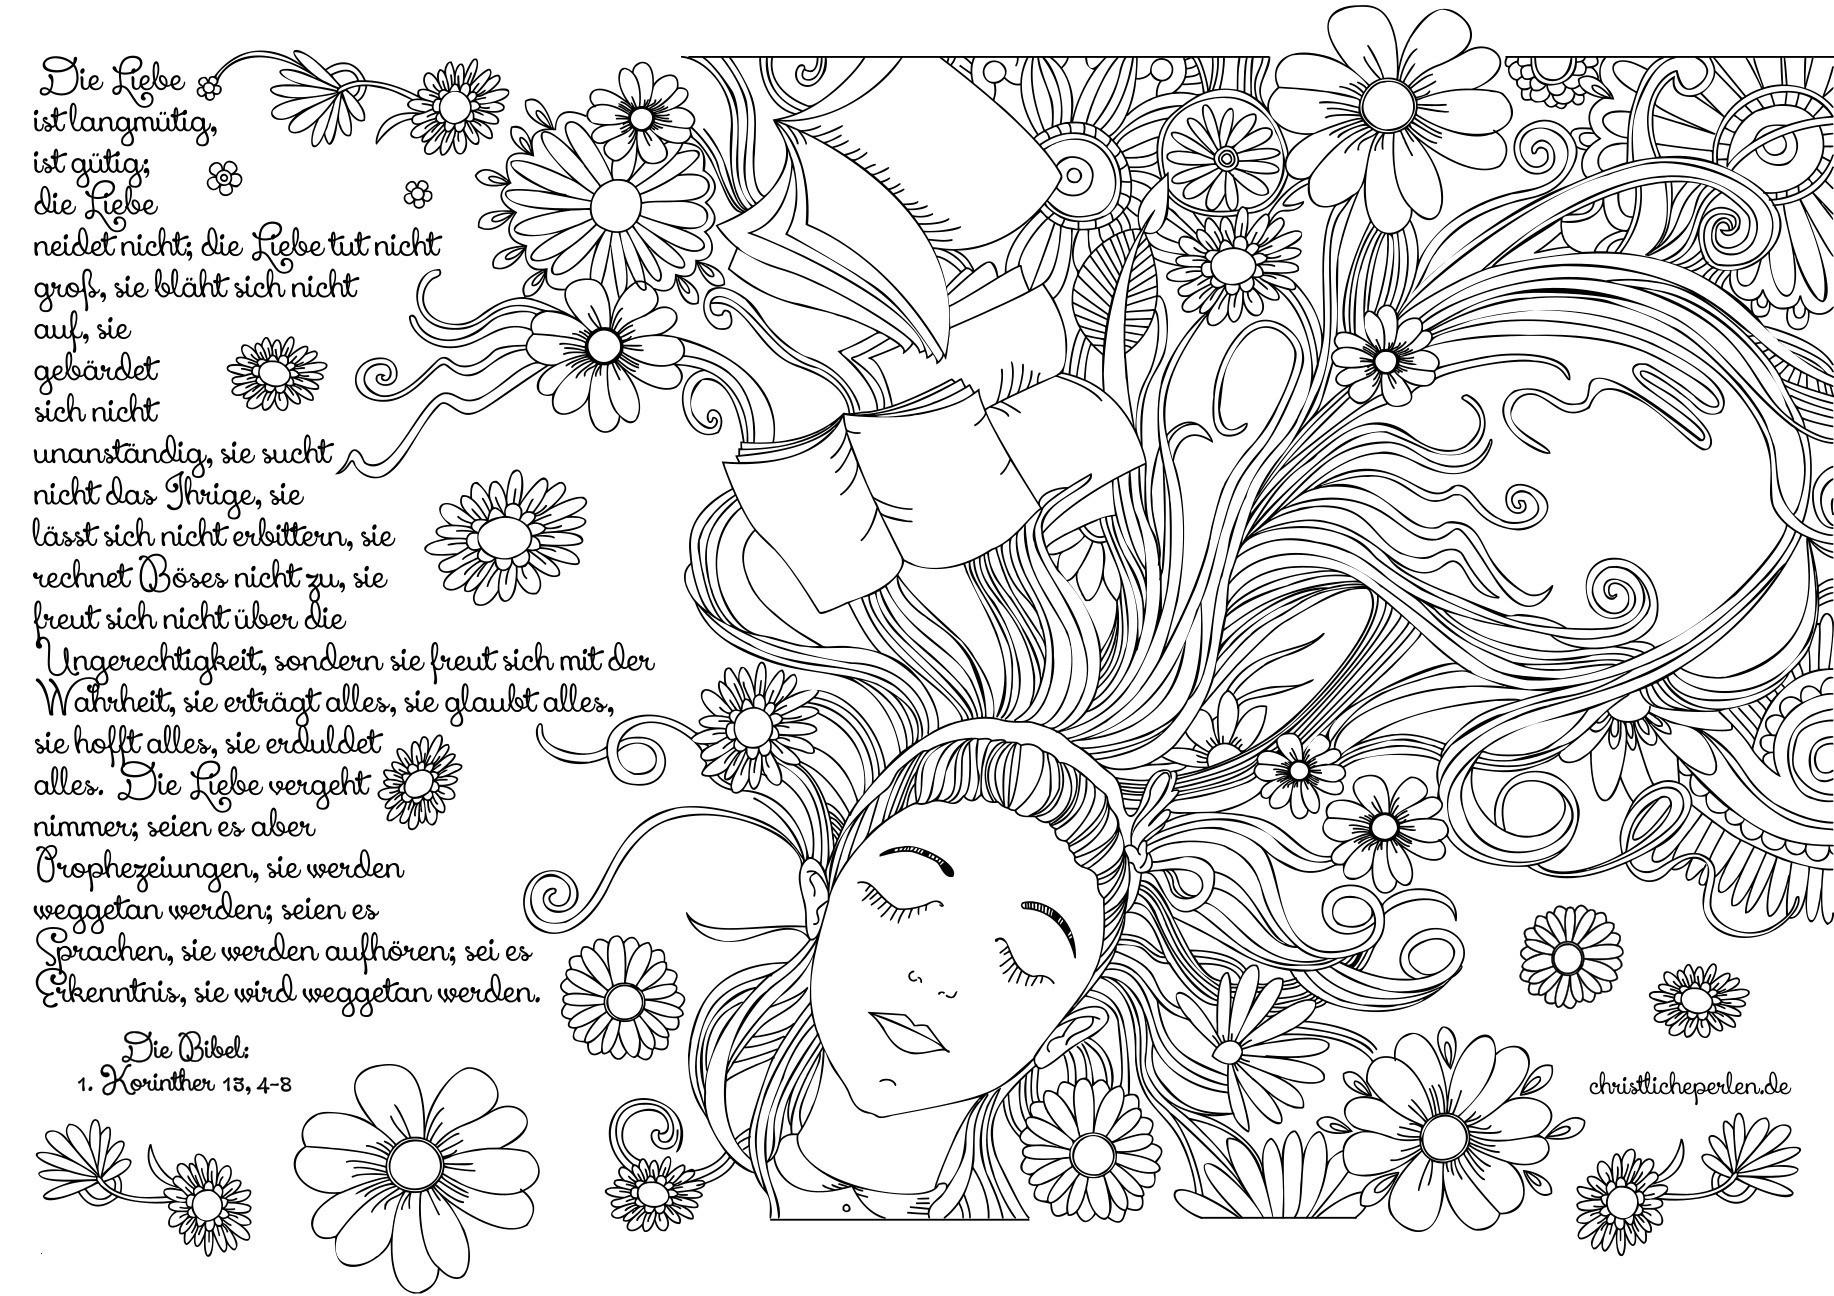 Minnie Maus Malvorlagen Neu Die Maus Ausmalbilder Beautiful Coloring Page Neu Minni Maus Stock